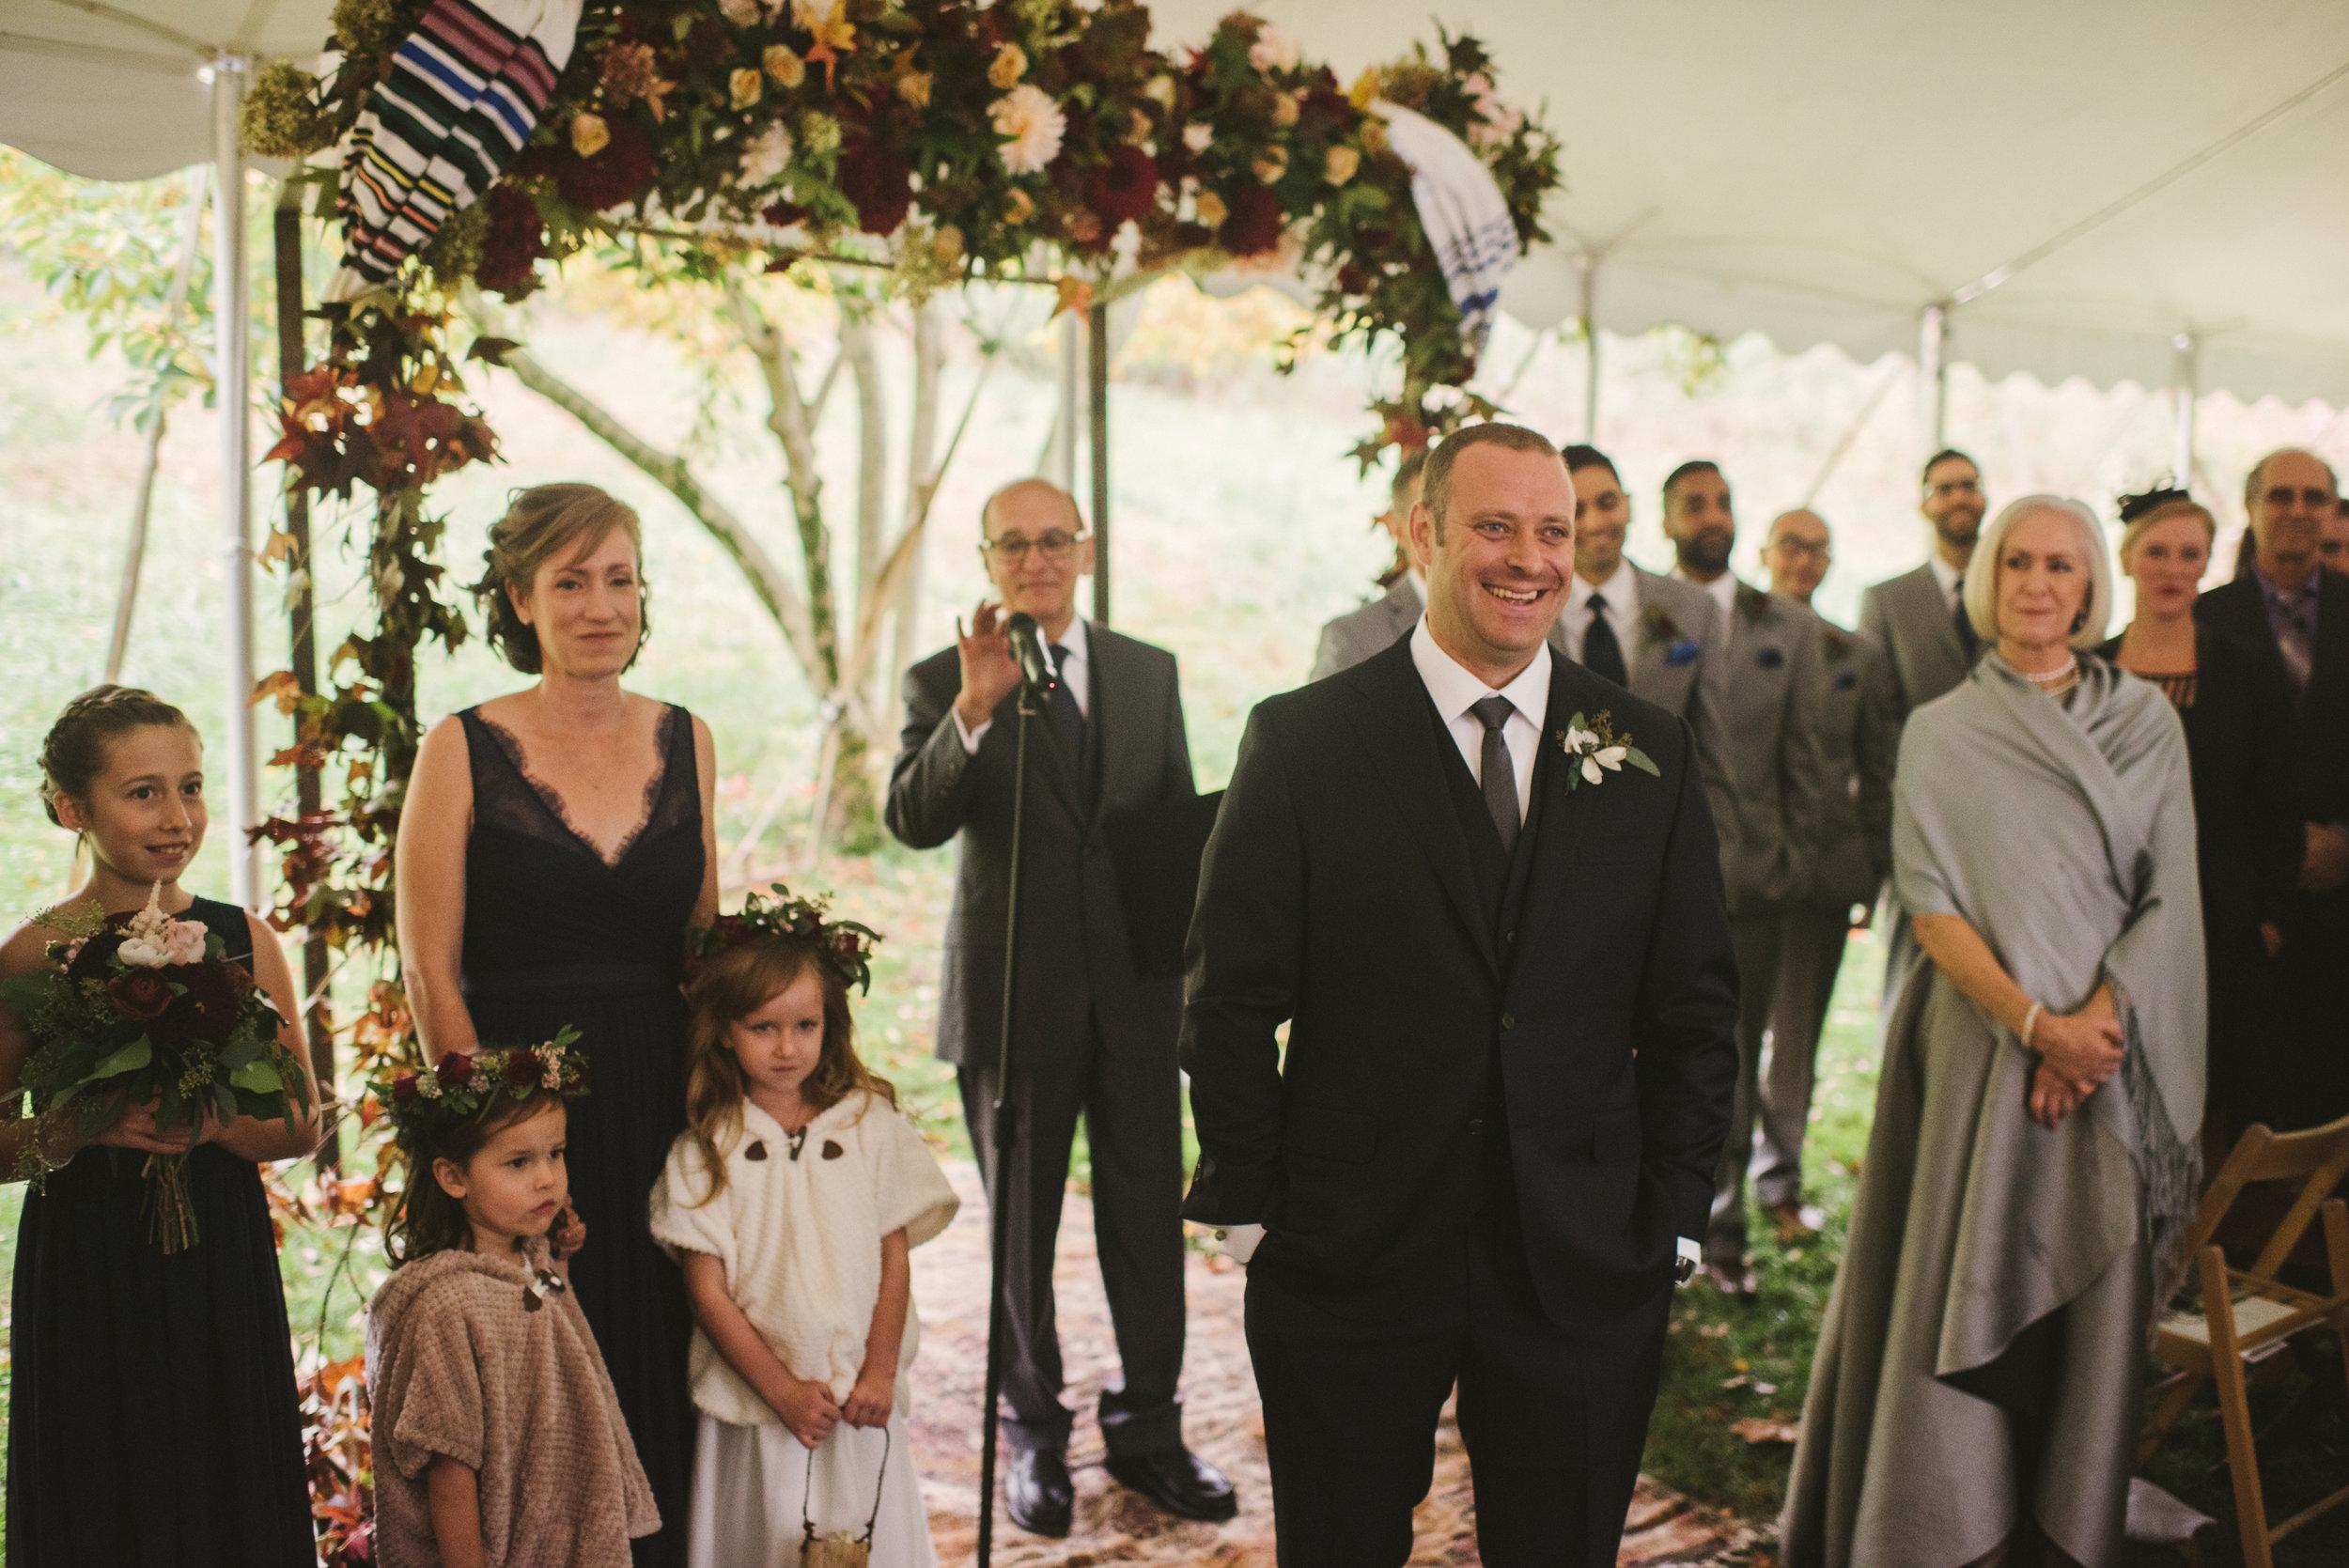 JACQUELINE & ANDREW WARSHAWER -BROOKMILL FARM FALL WEDDING - INTIMATE WEDDING PHOTOGRAPHER - TWOTWENTY by CHI-CHI AGBIM-216.jpg